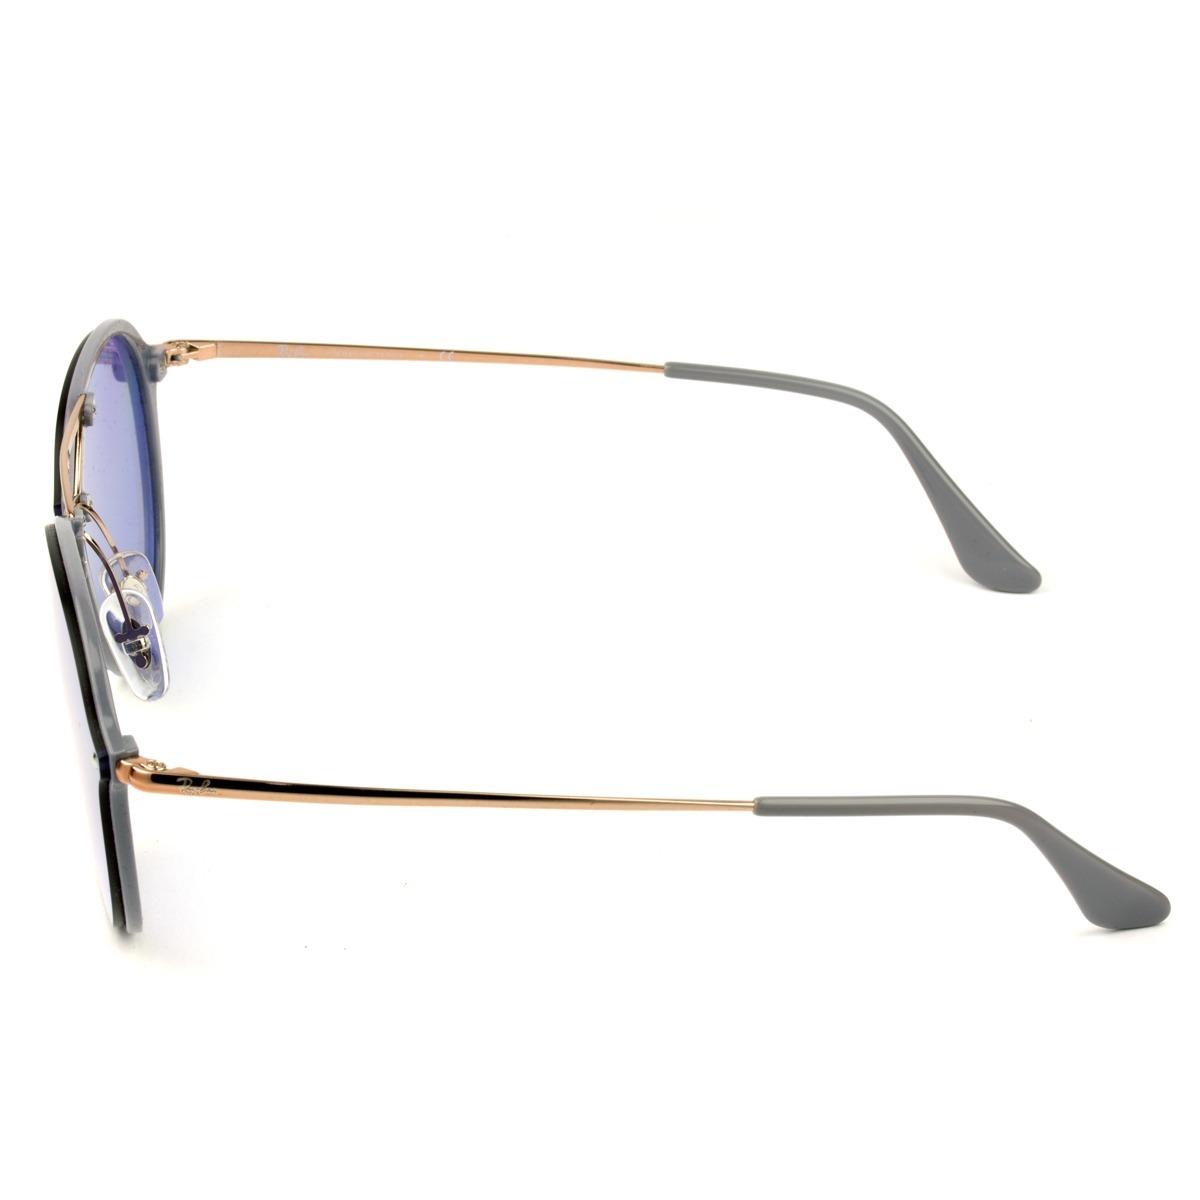 2d5d9e33b4cdb ray ban blaze rb4292-n 6326 1u 62 - óculos de sol. Carregando zoom... ray  ban óculos sol. Carregando zoom.